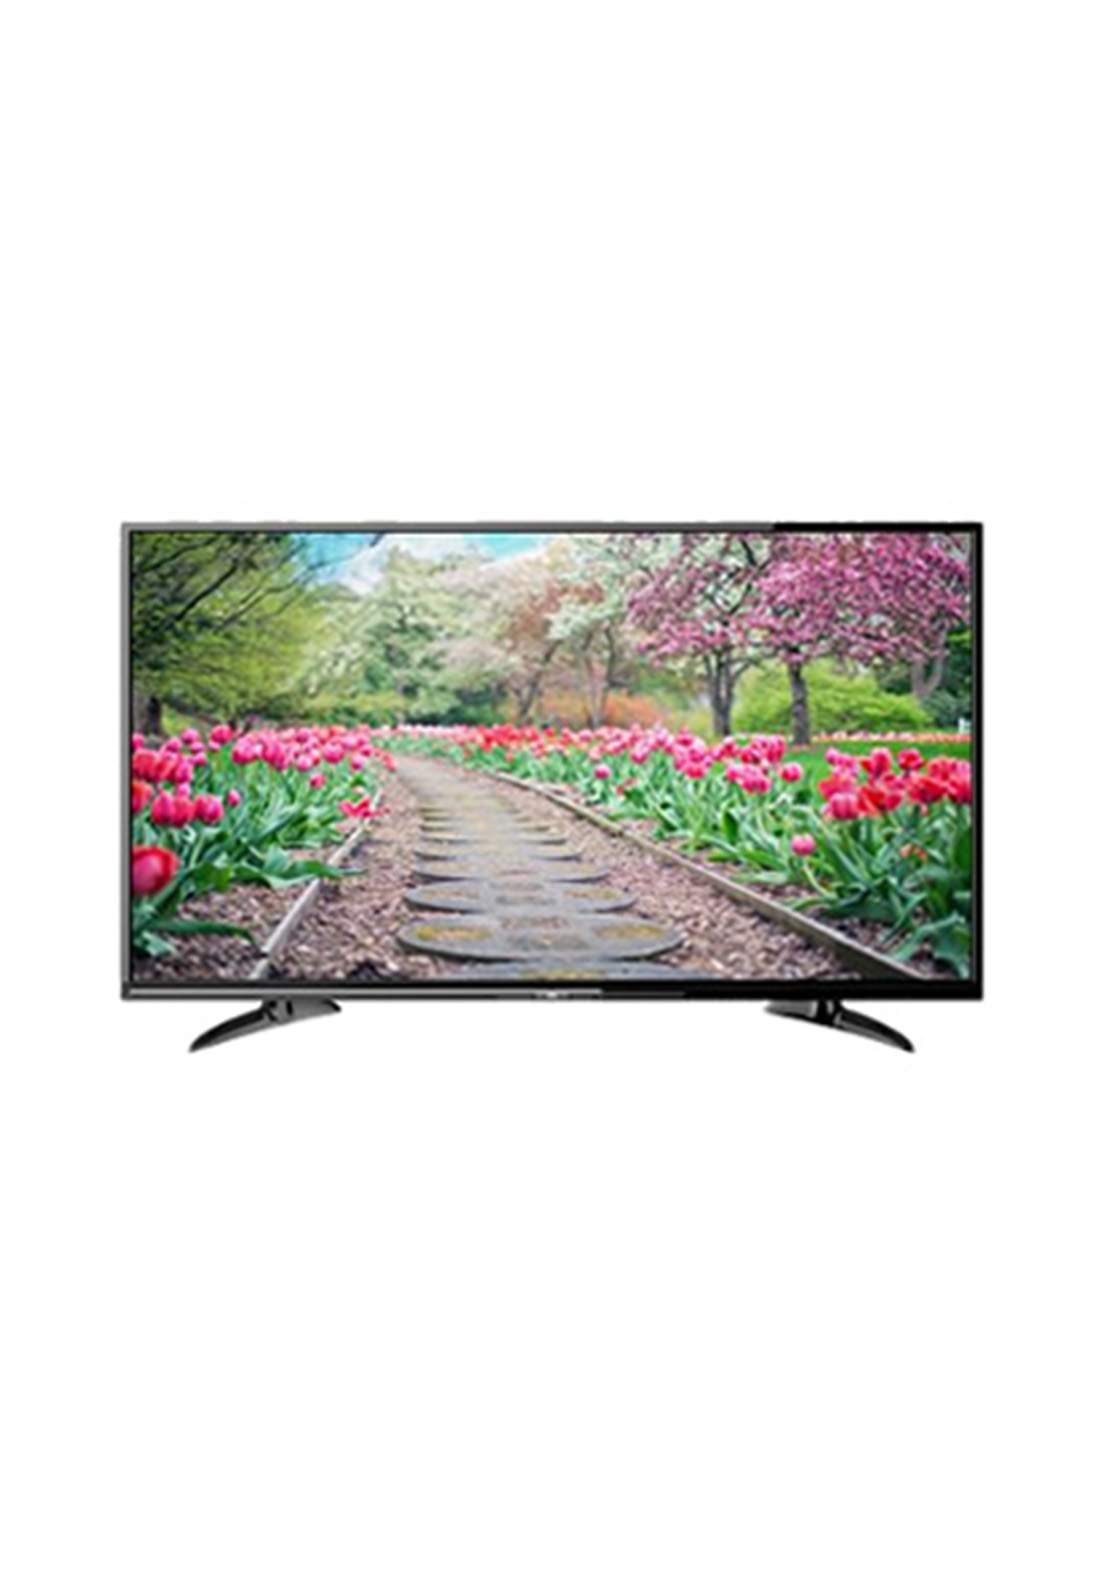 Beko B55M-57705B Full HD Smart Television 55 Inch - Black  شاشة